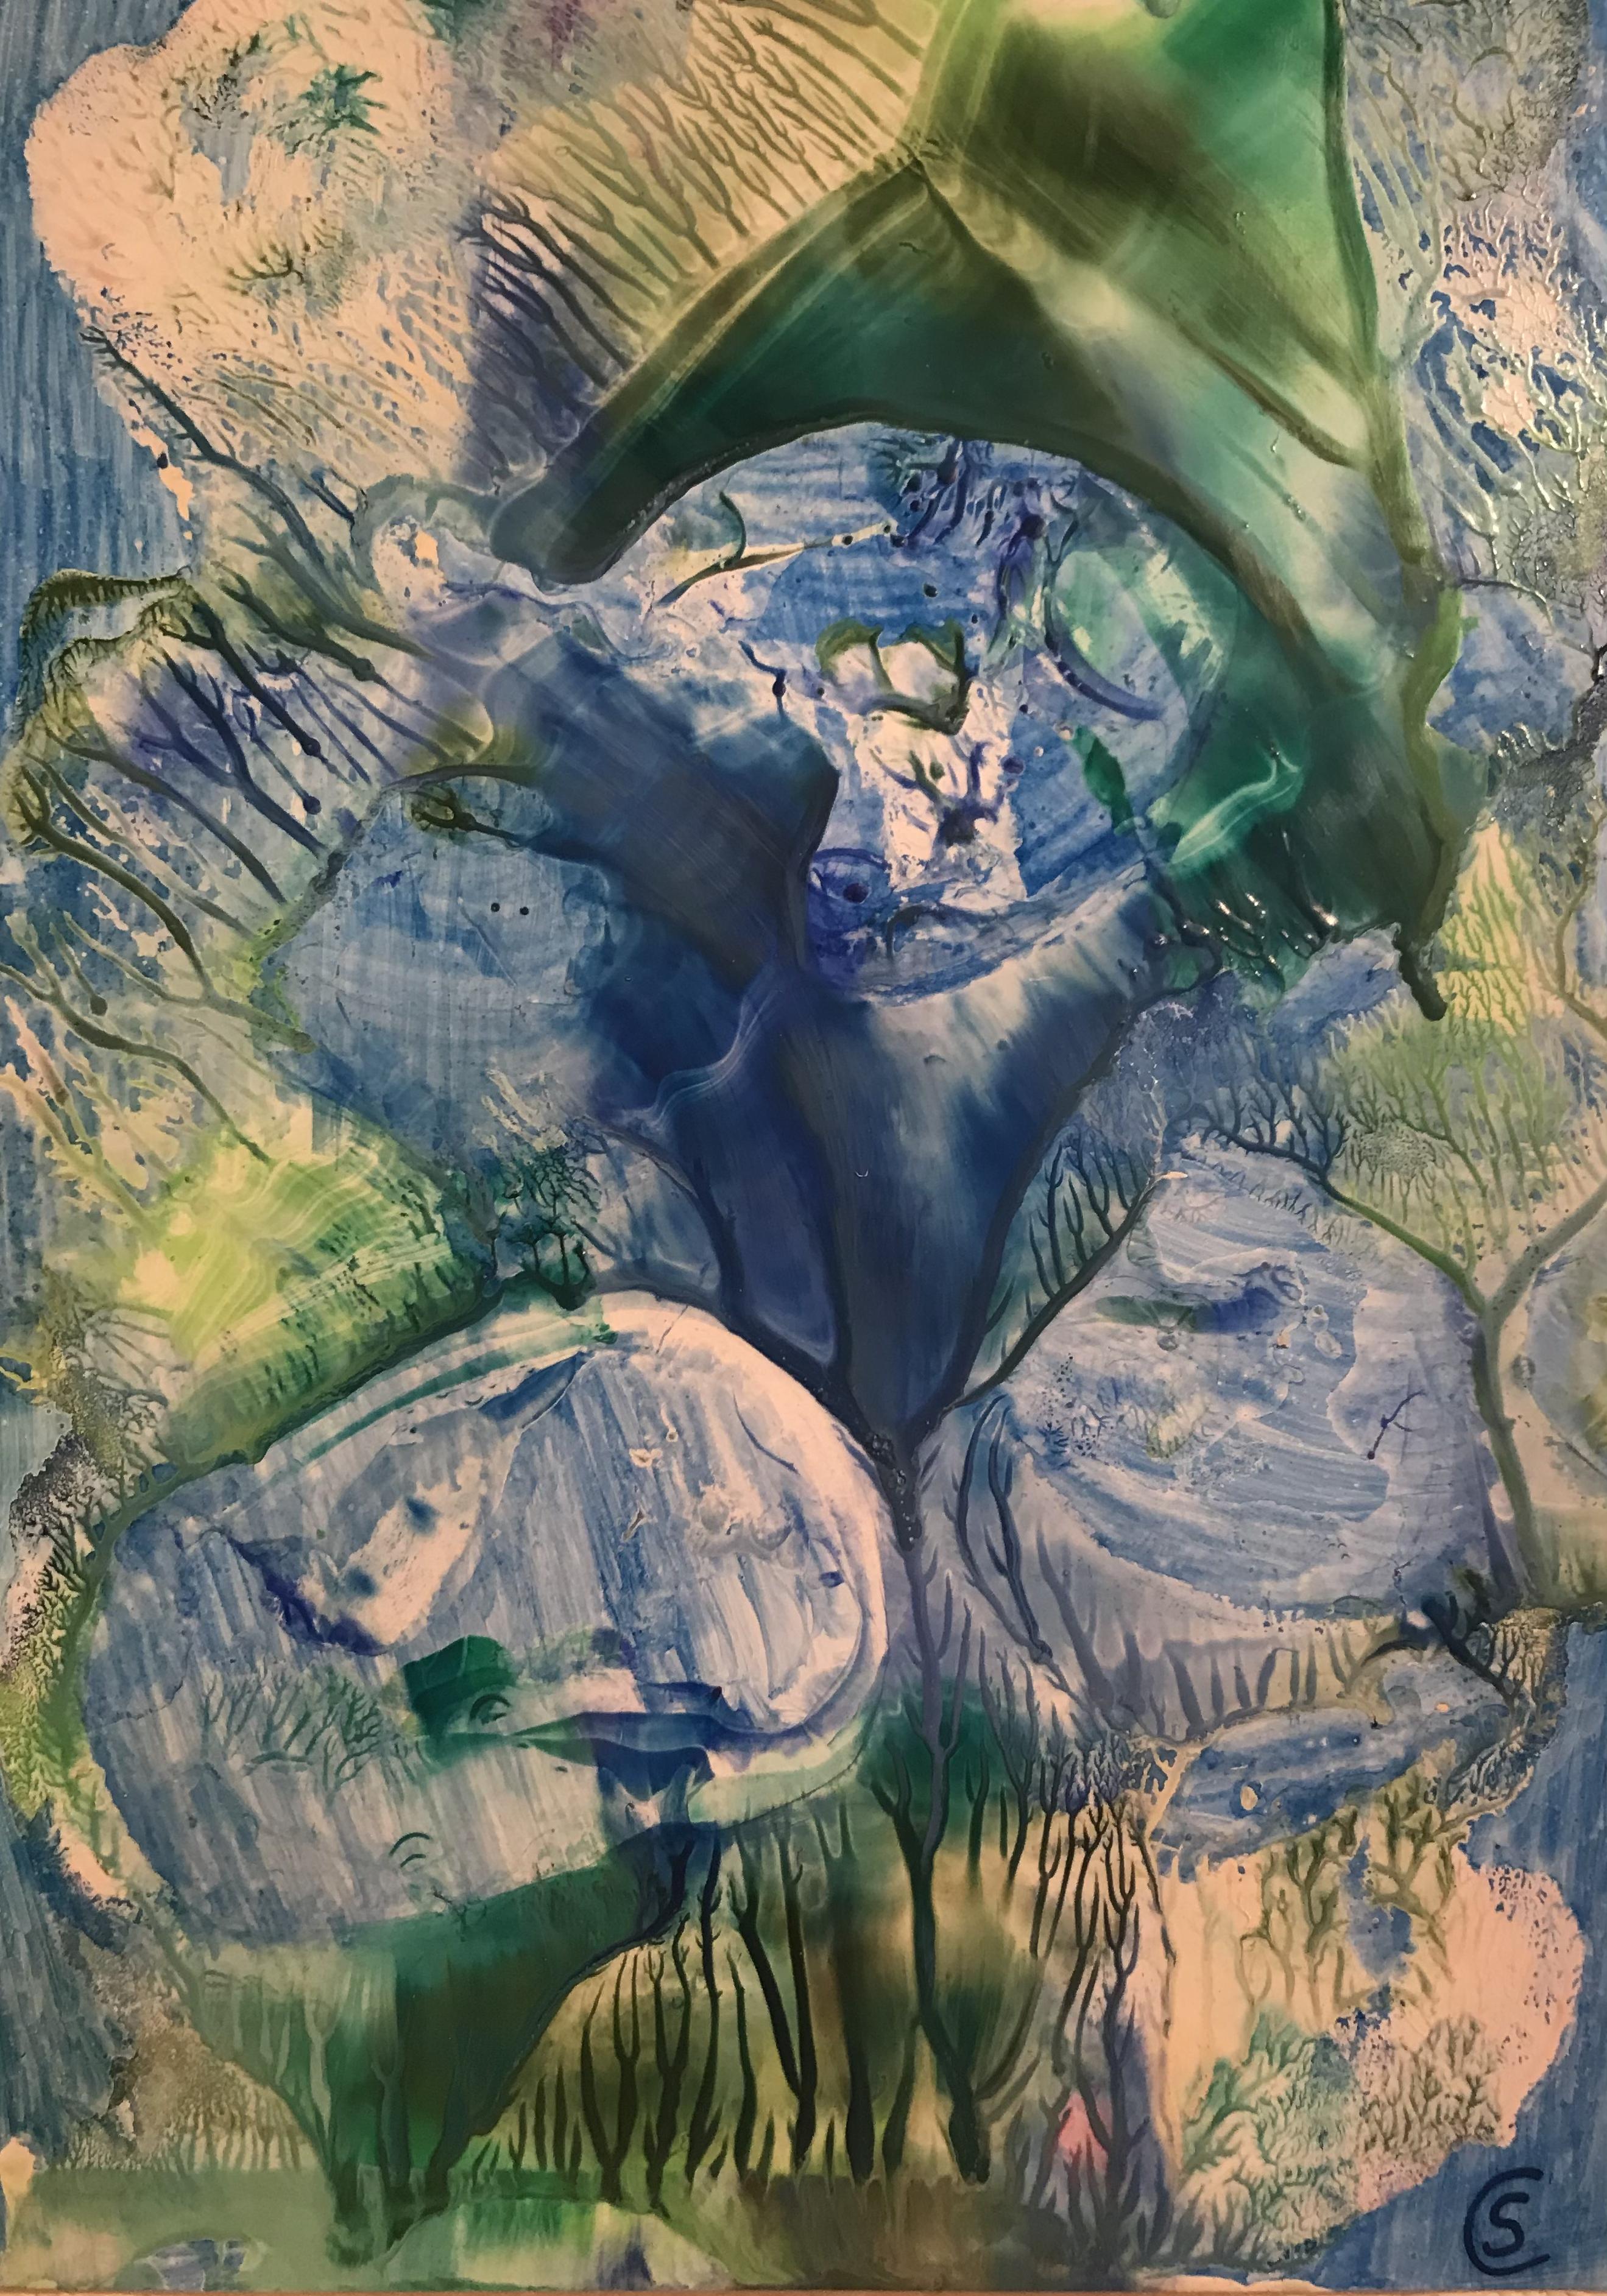 Submerged, Encaustic on paper, 21x30